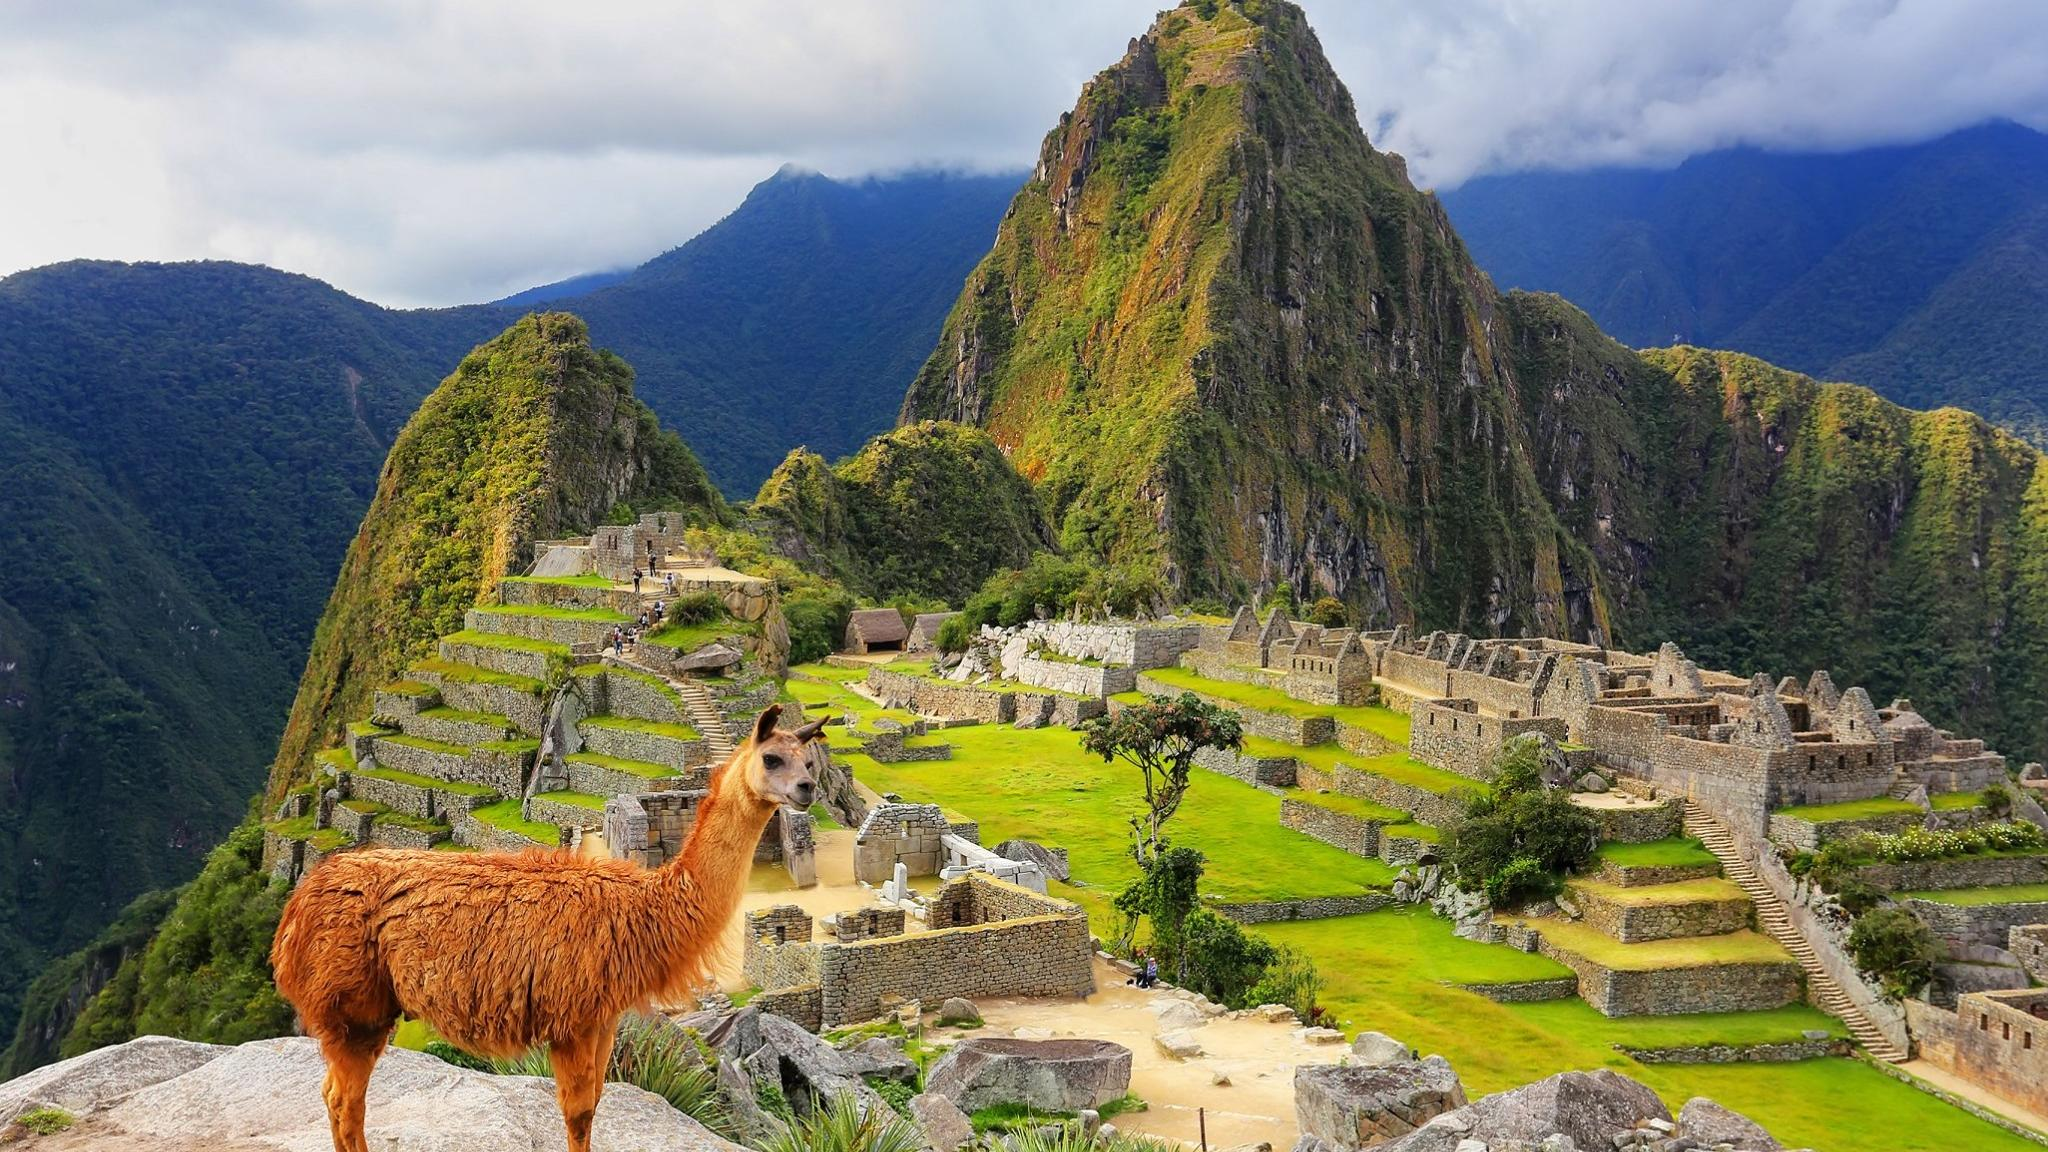 Conhecendo o Peru #2: Machu Picchu